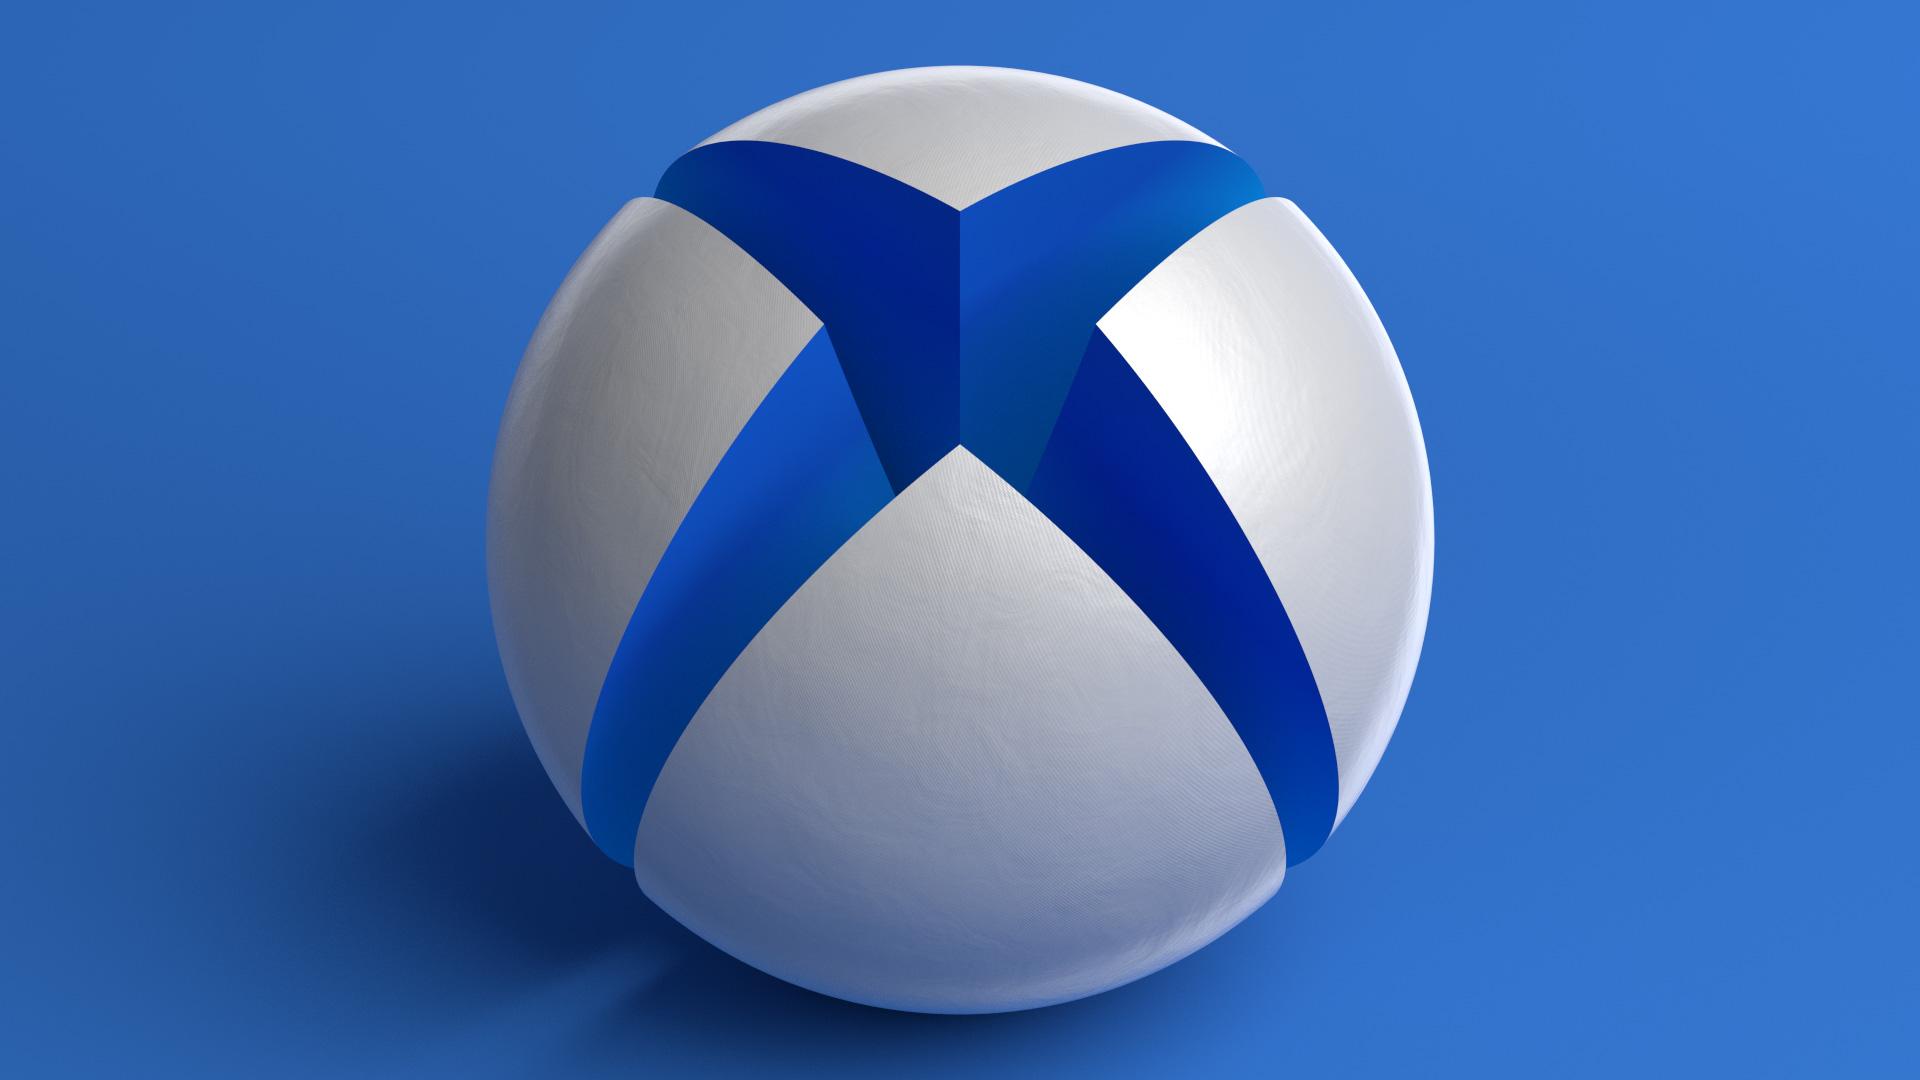 X1bg Giant Xbox Sphere Blue Martin Crownover